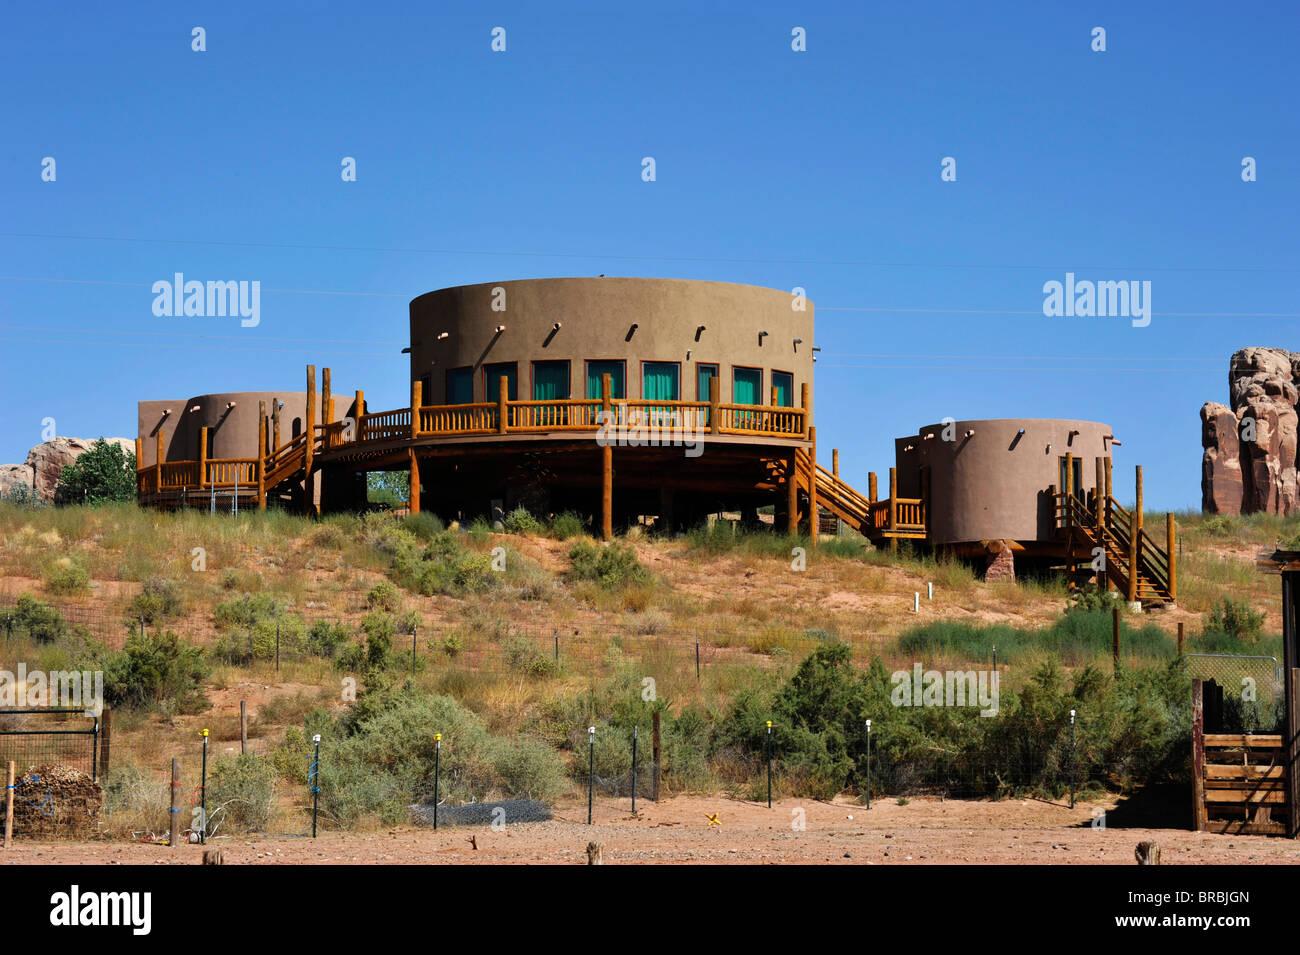 Wüste Urlaub nach Hause Bluff Arizona USA Stockbild